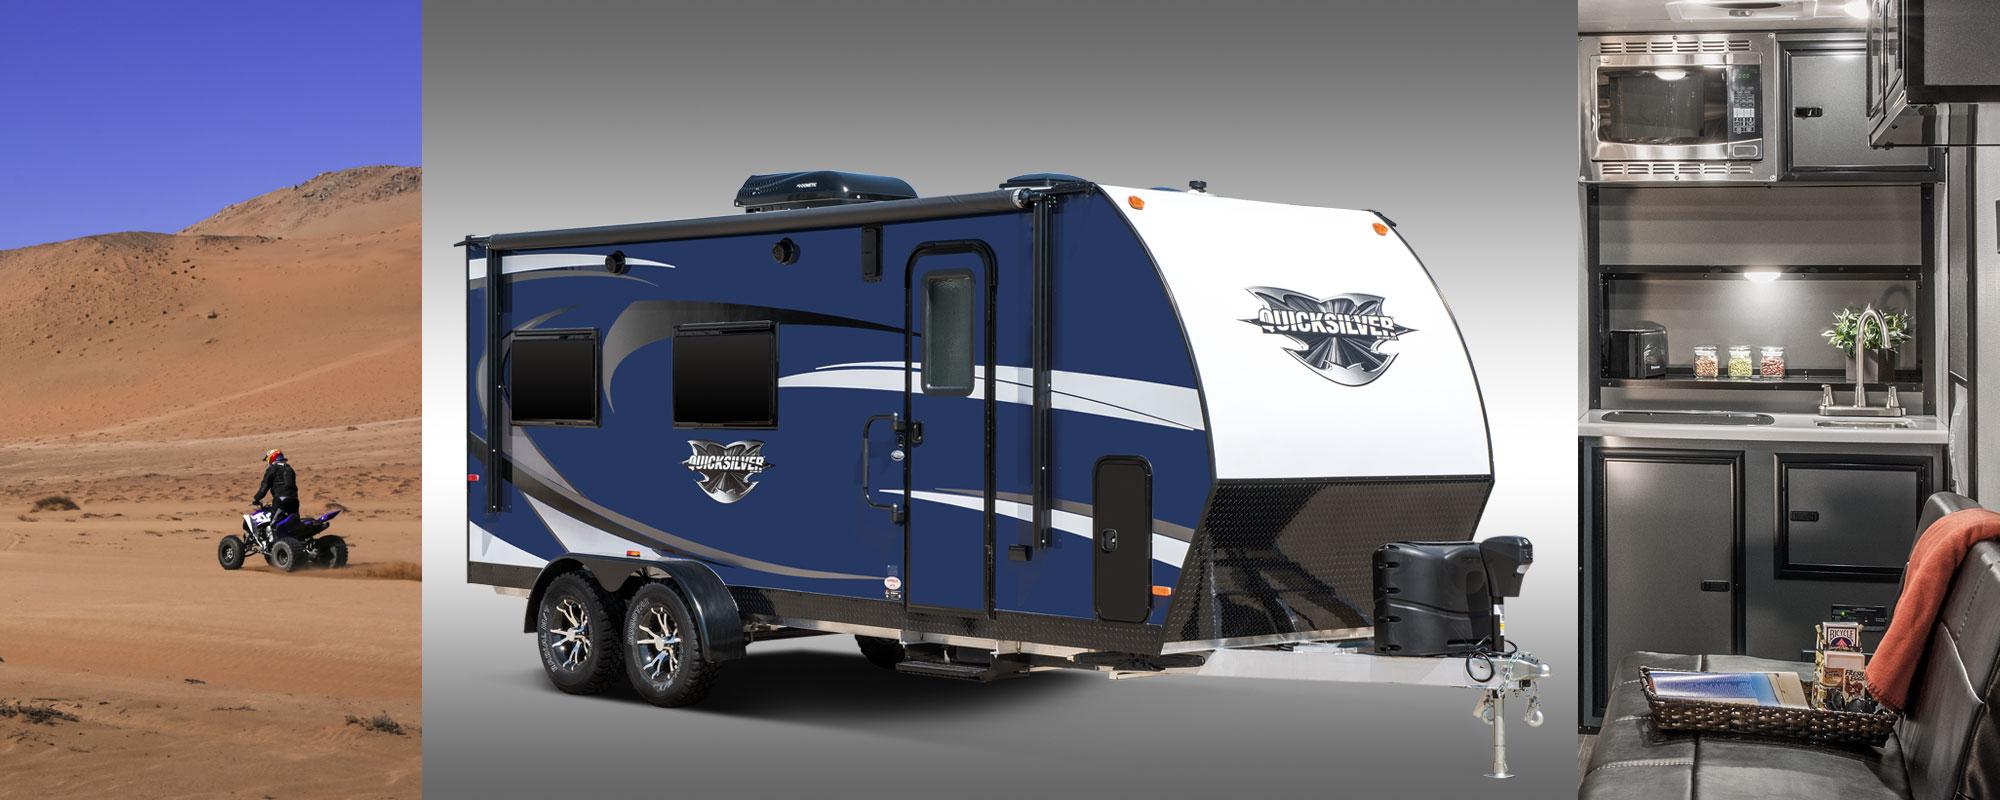 Livin' Lite | Aluminum-Framed Ultra Lightweight Campers